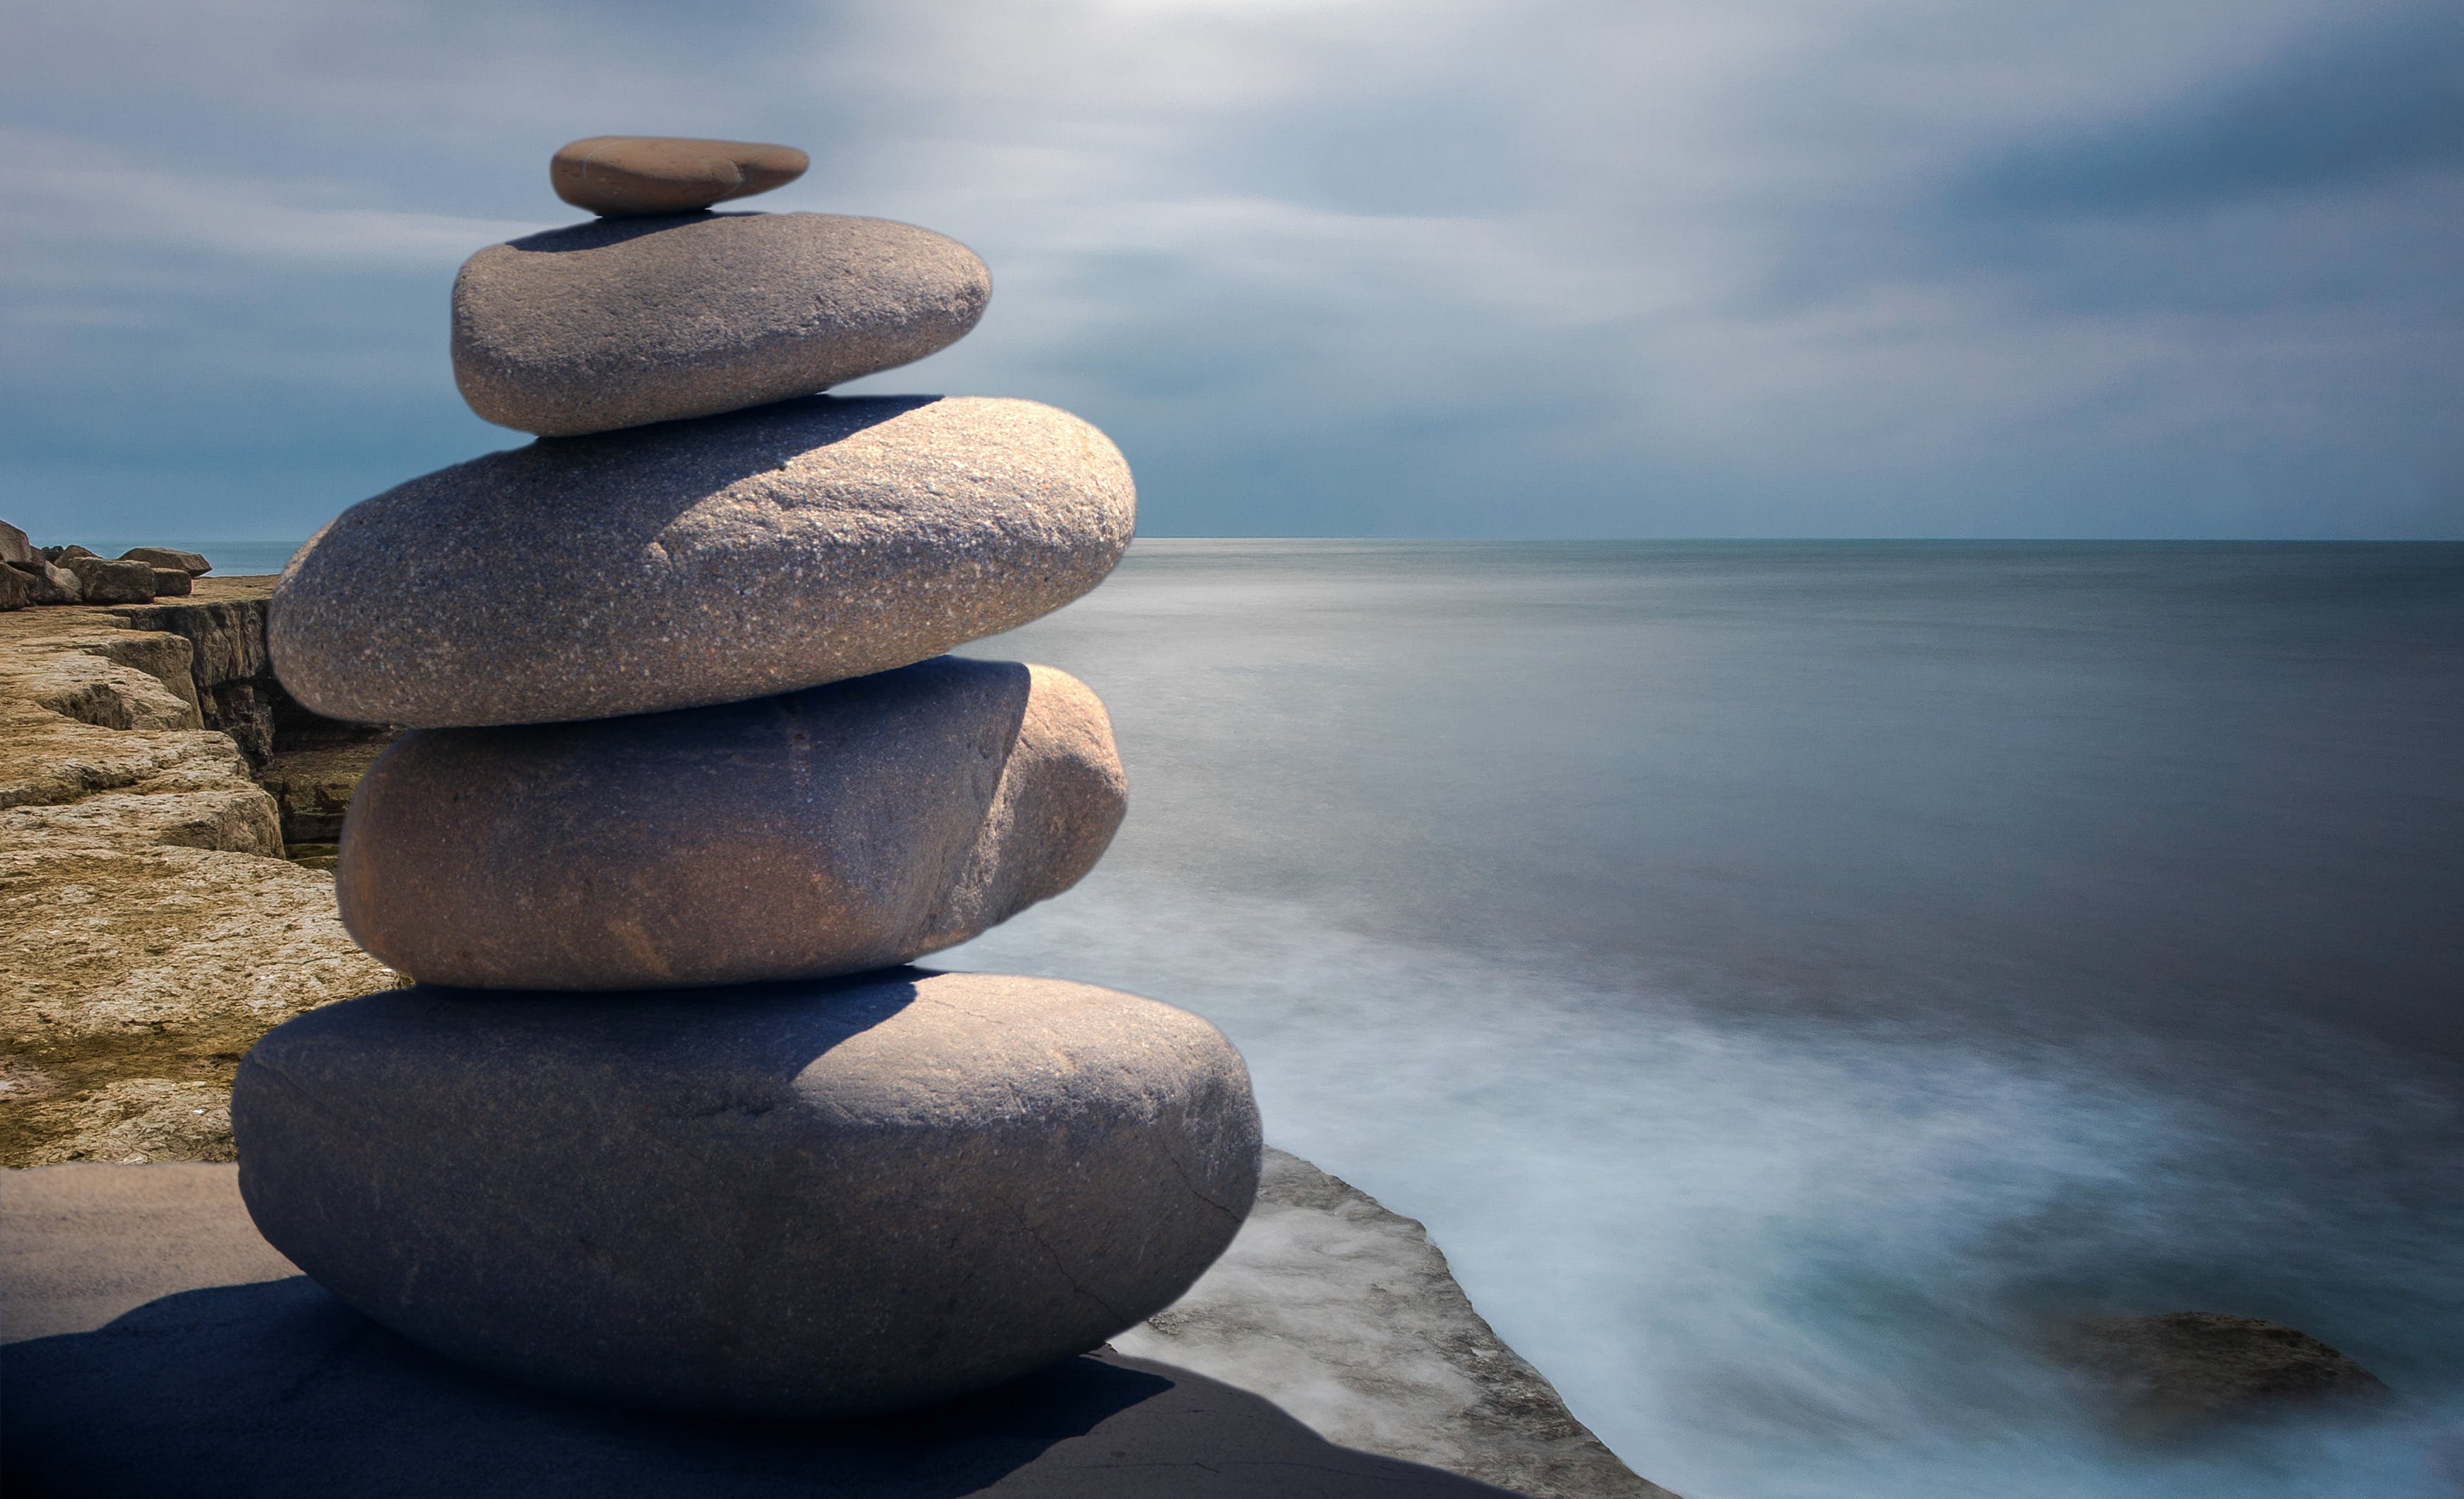 Free stock photo of relaxation, texture, stones, design